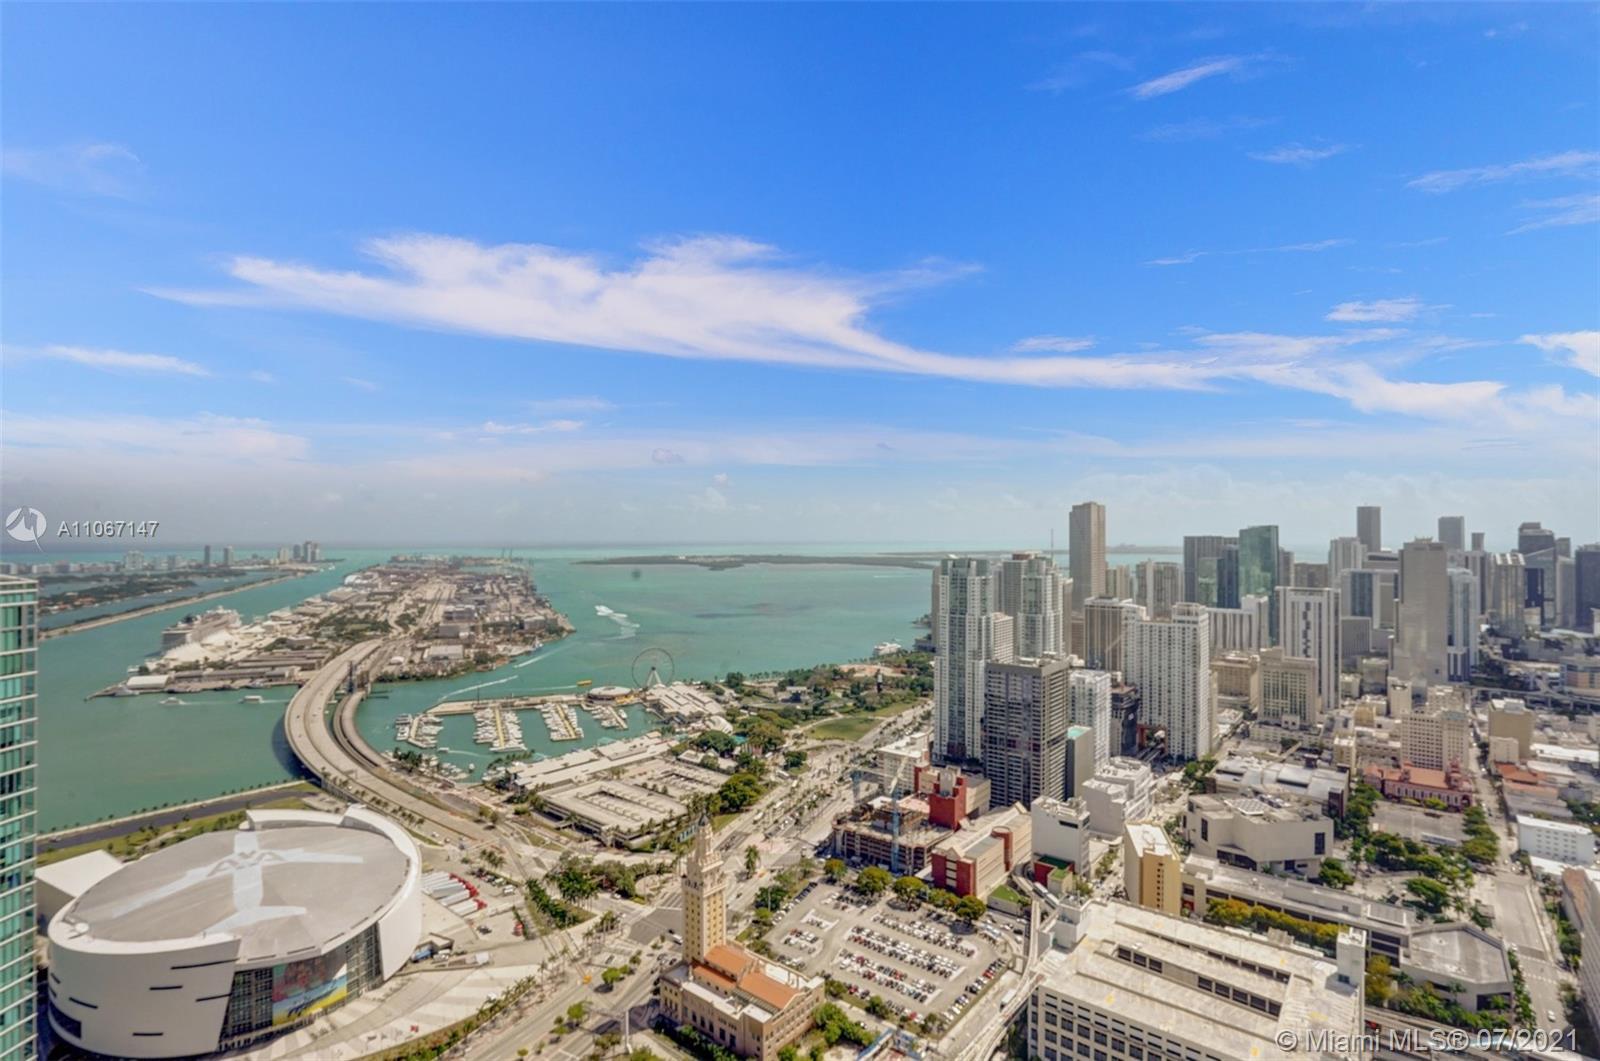 Paramount Miami Worldcenter #4405 - 85 - photo